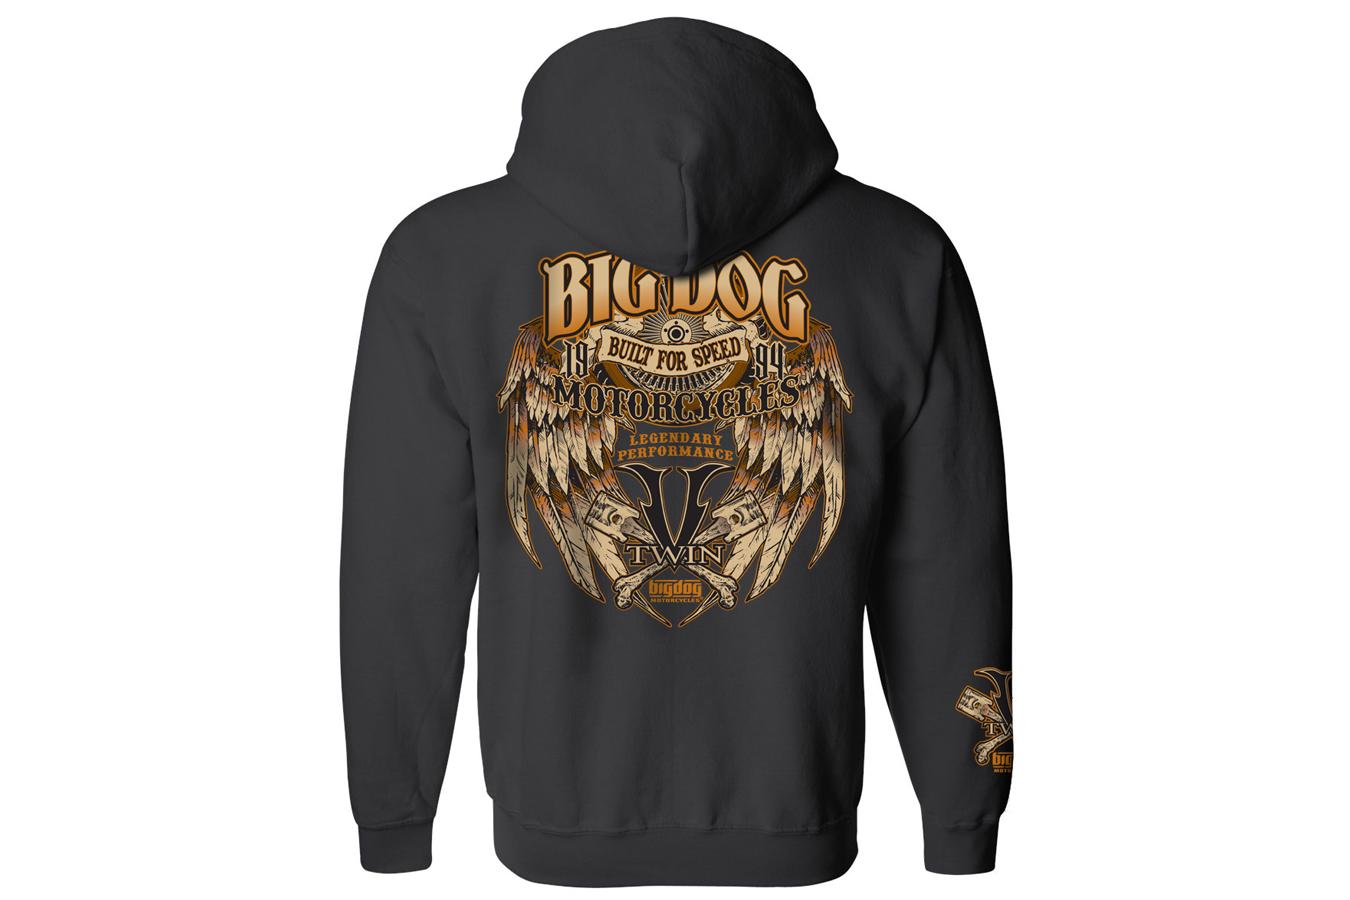 big dog motorcycles built for speed full zip hoodie black 54 95 58 95 [ 1350 x 900 Pixel ]